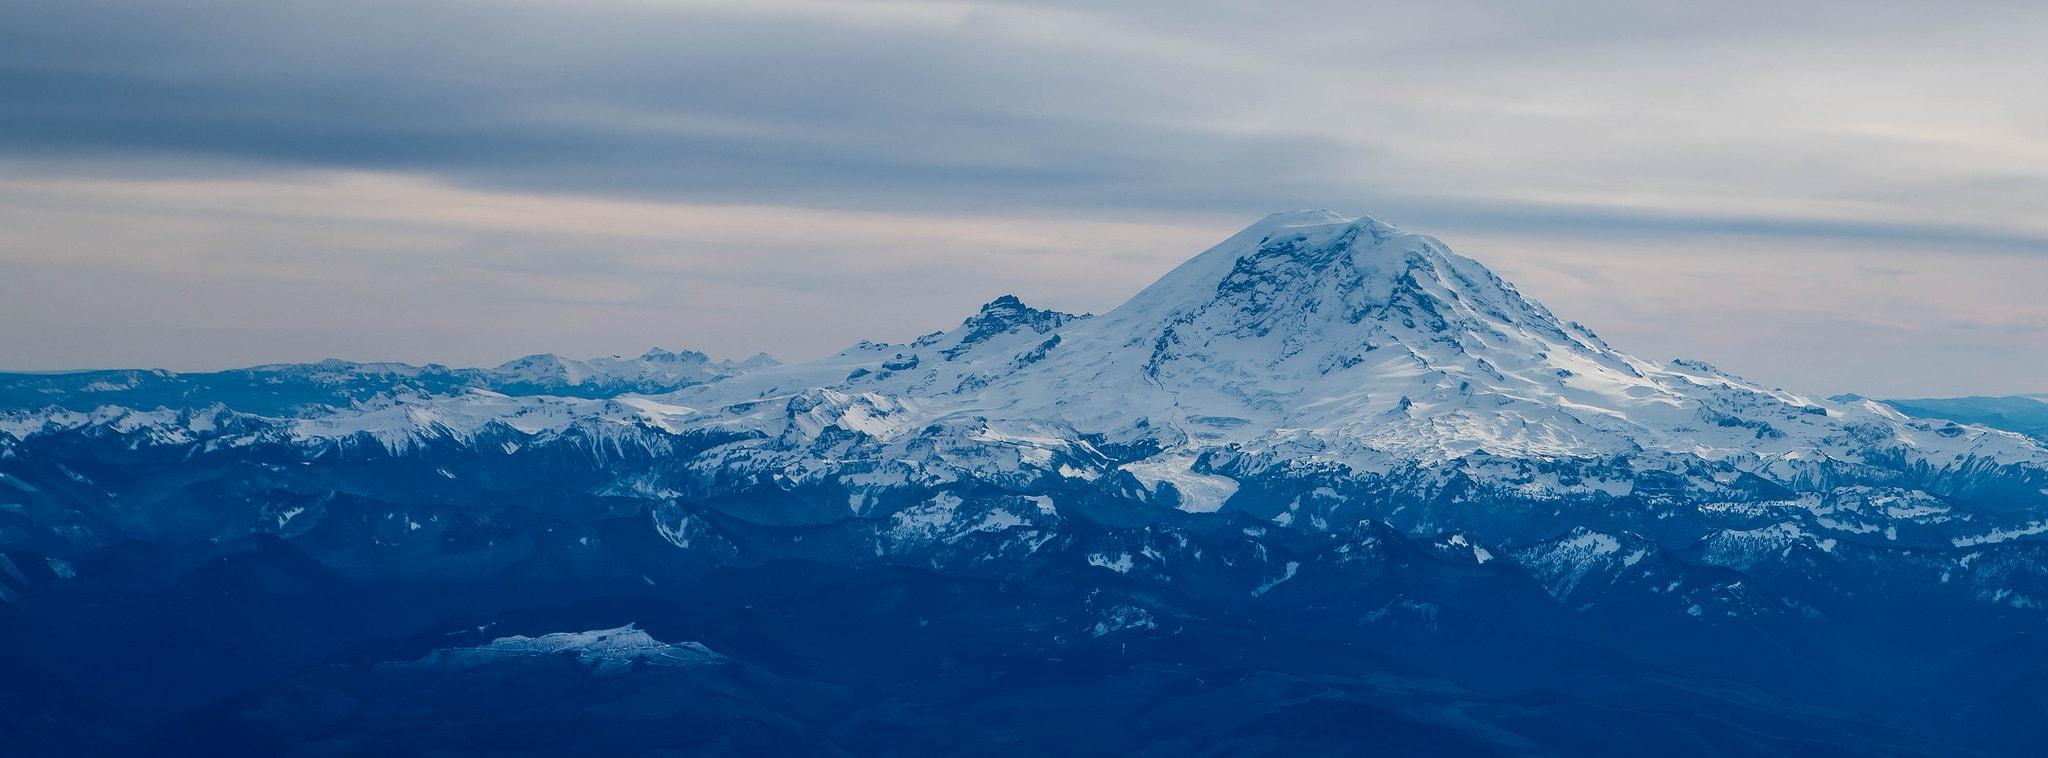 Mt. Rainier | © Suman Chakrabarti / Flickr